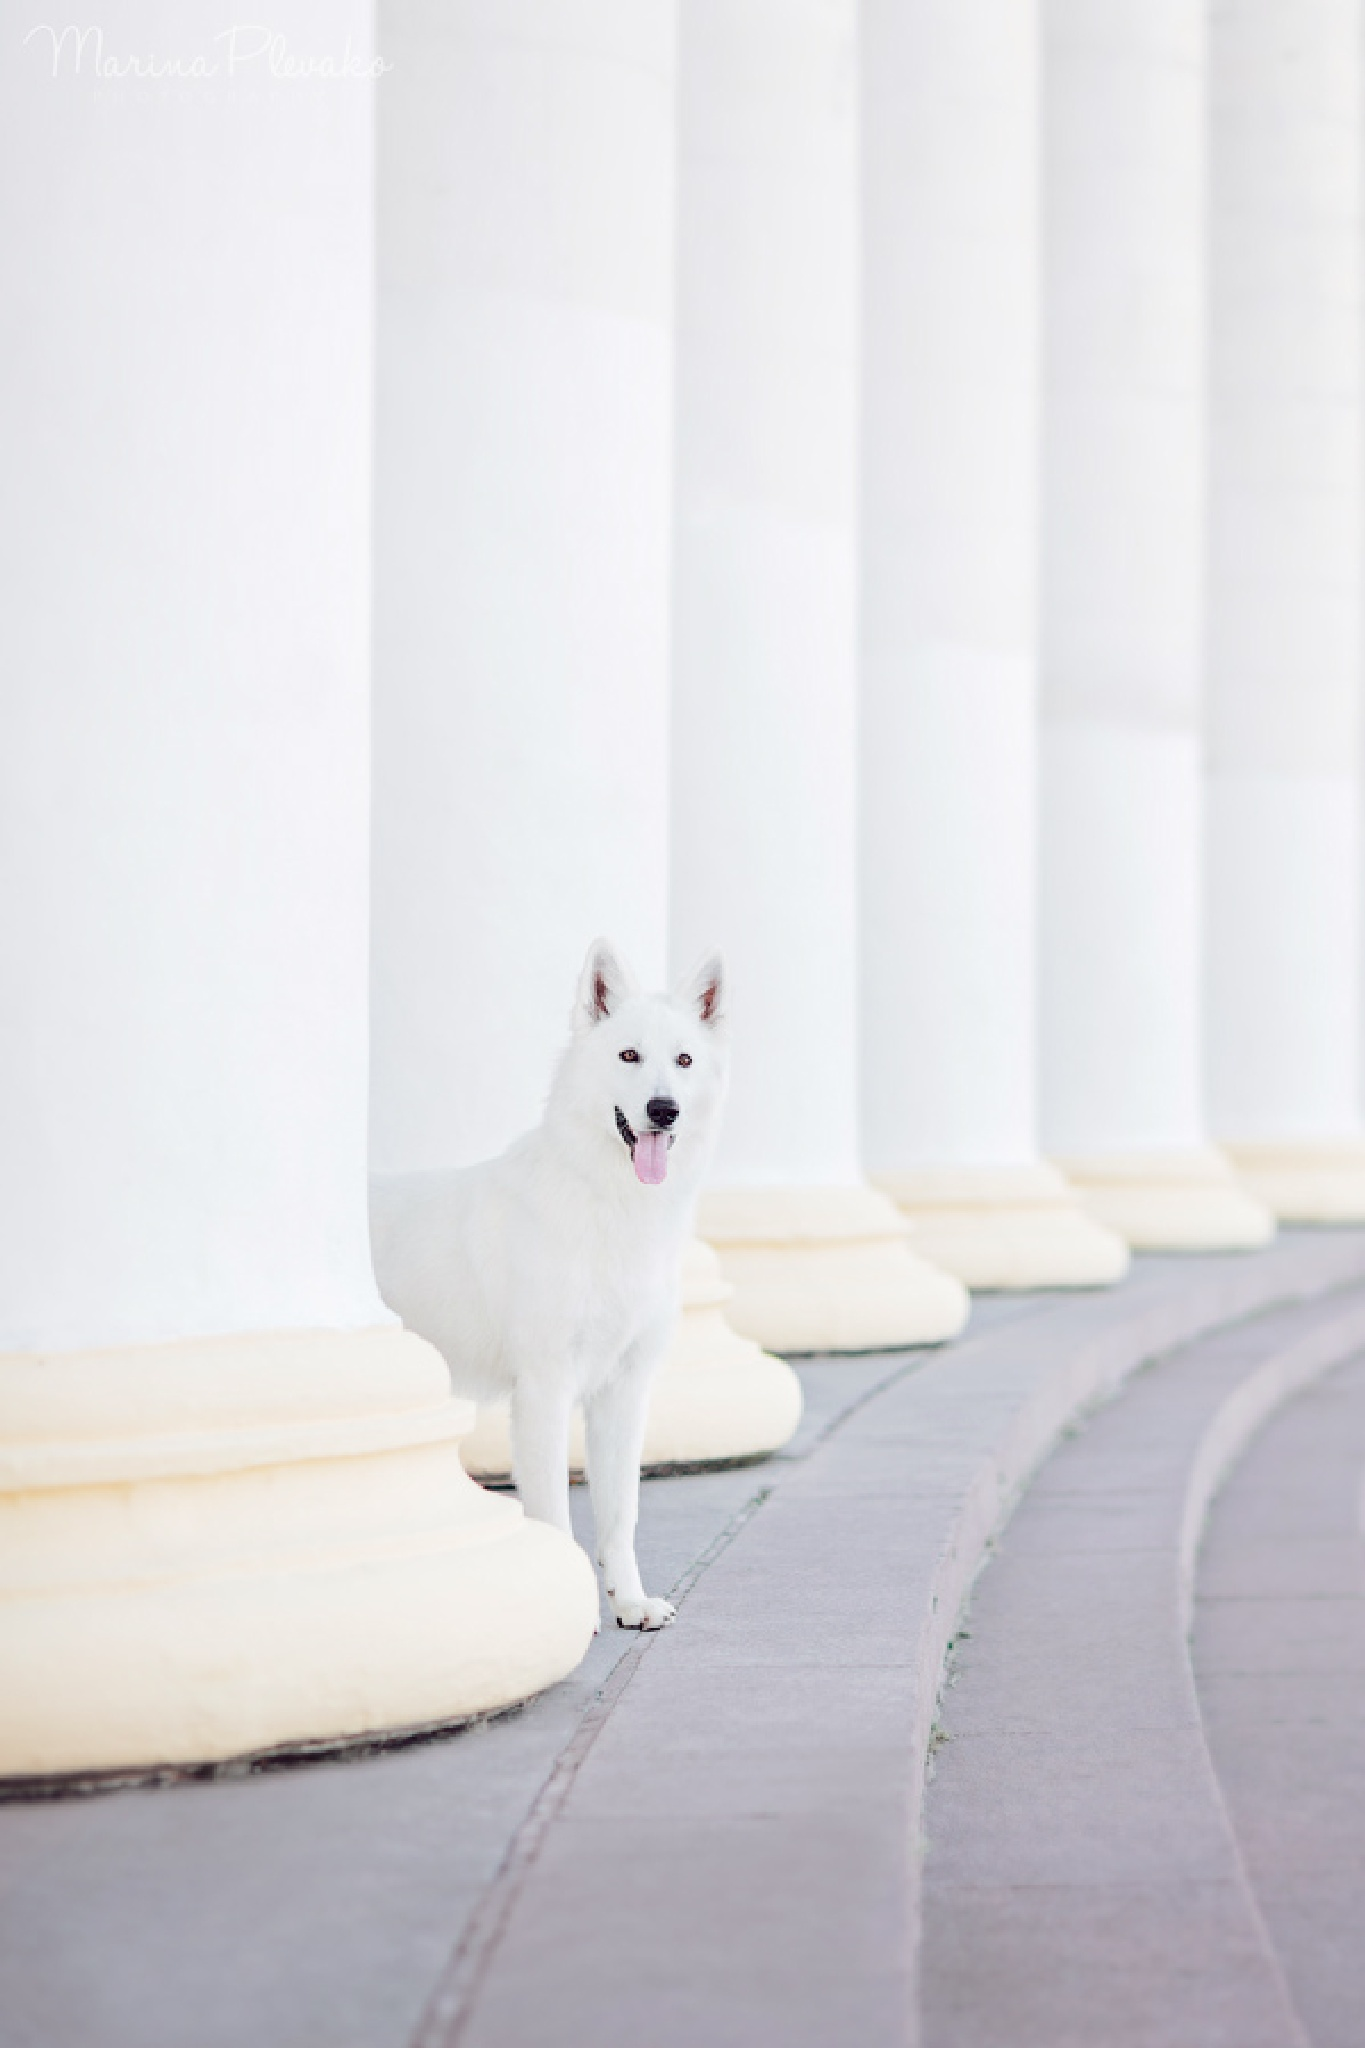 White on White by Marina Plevako